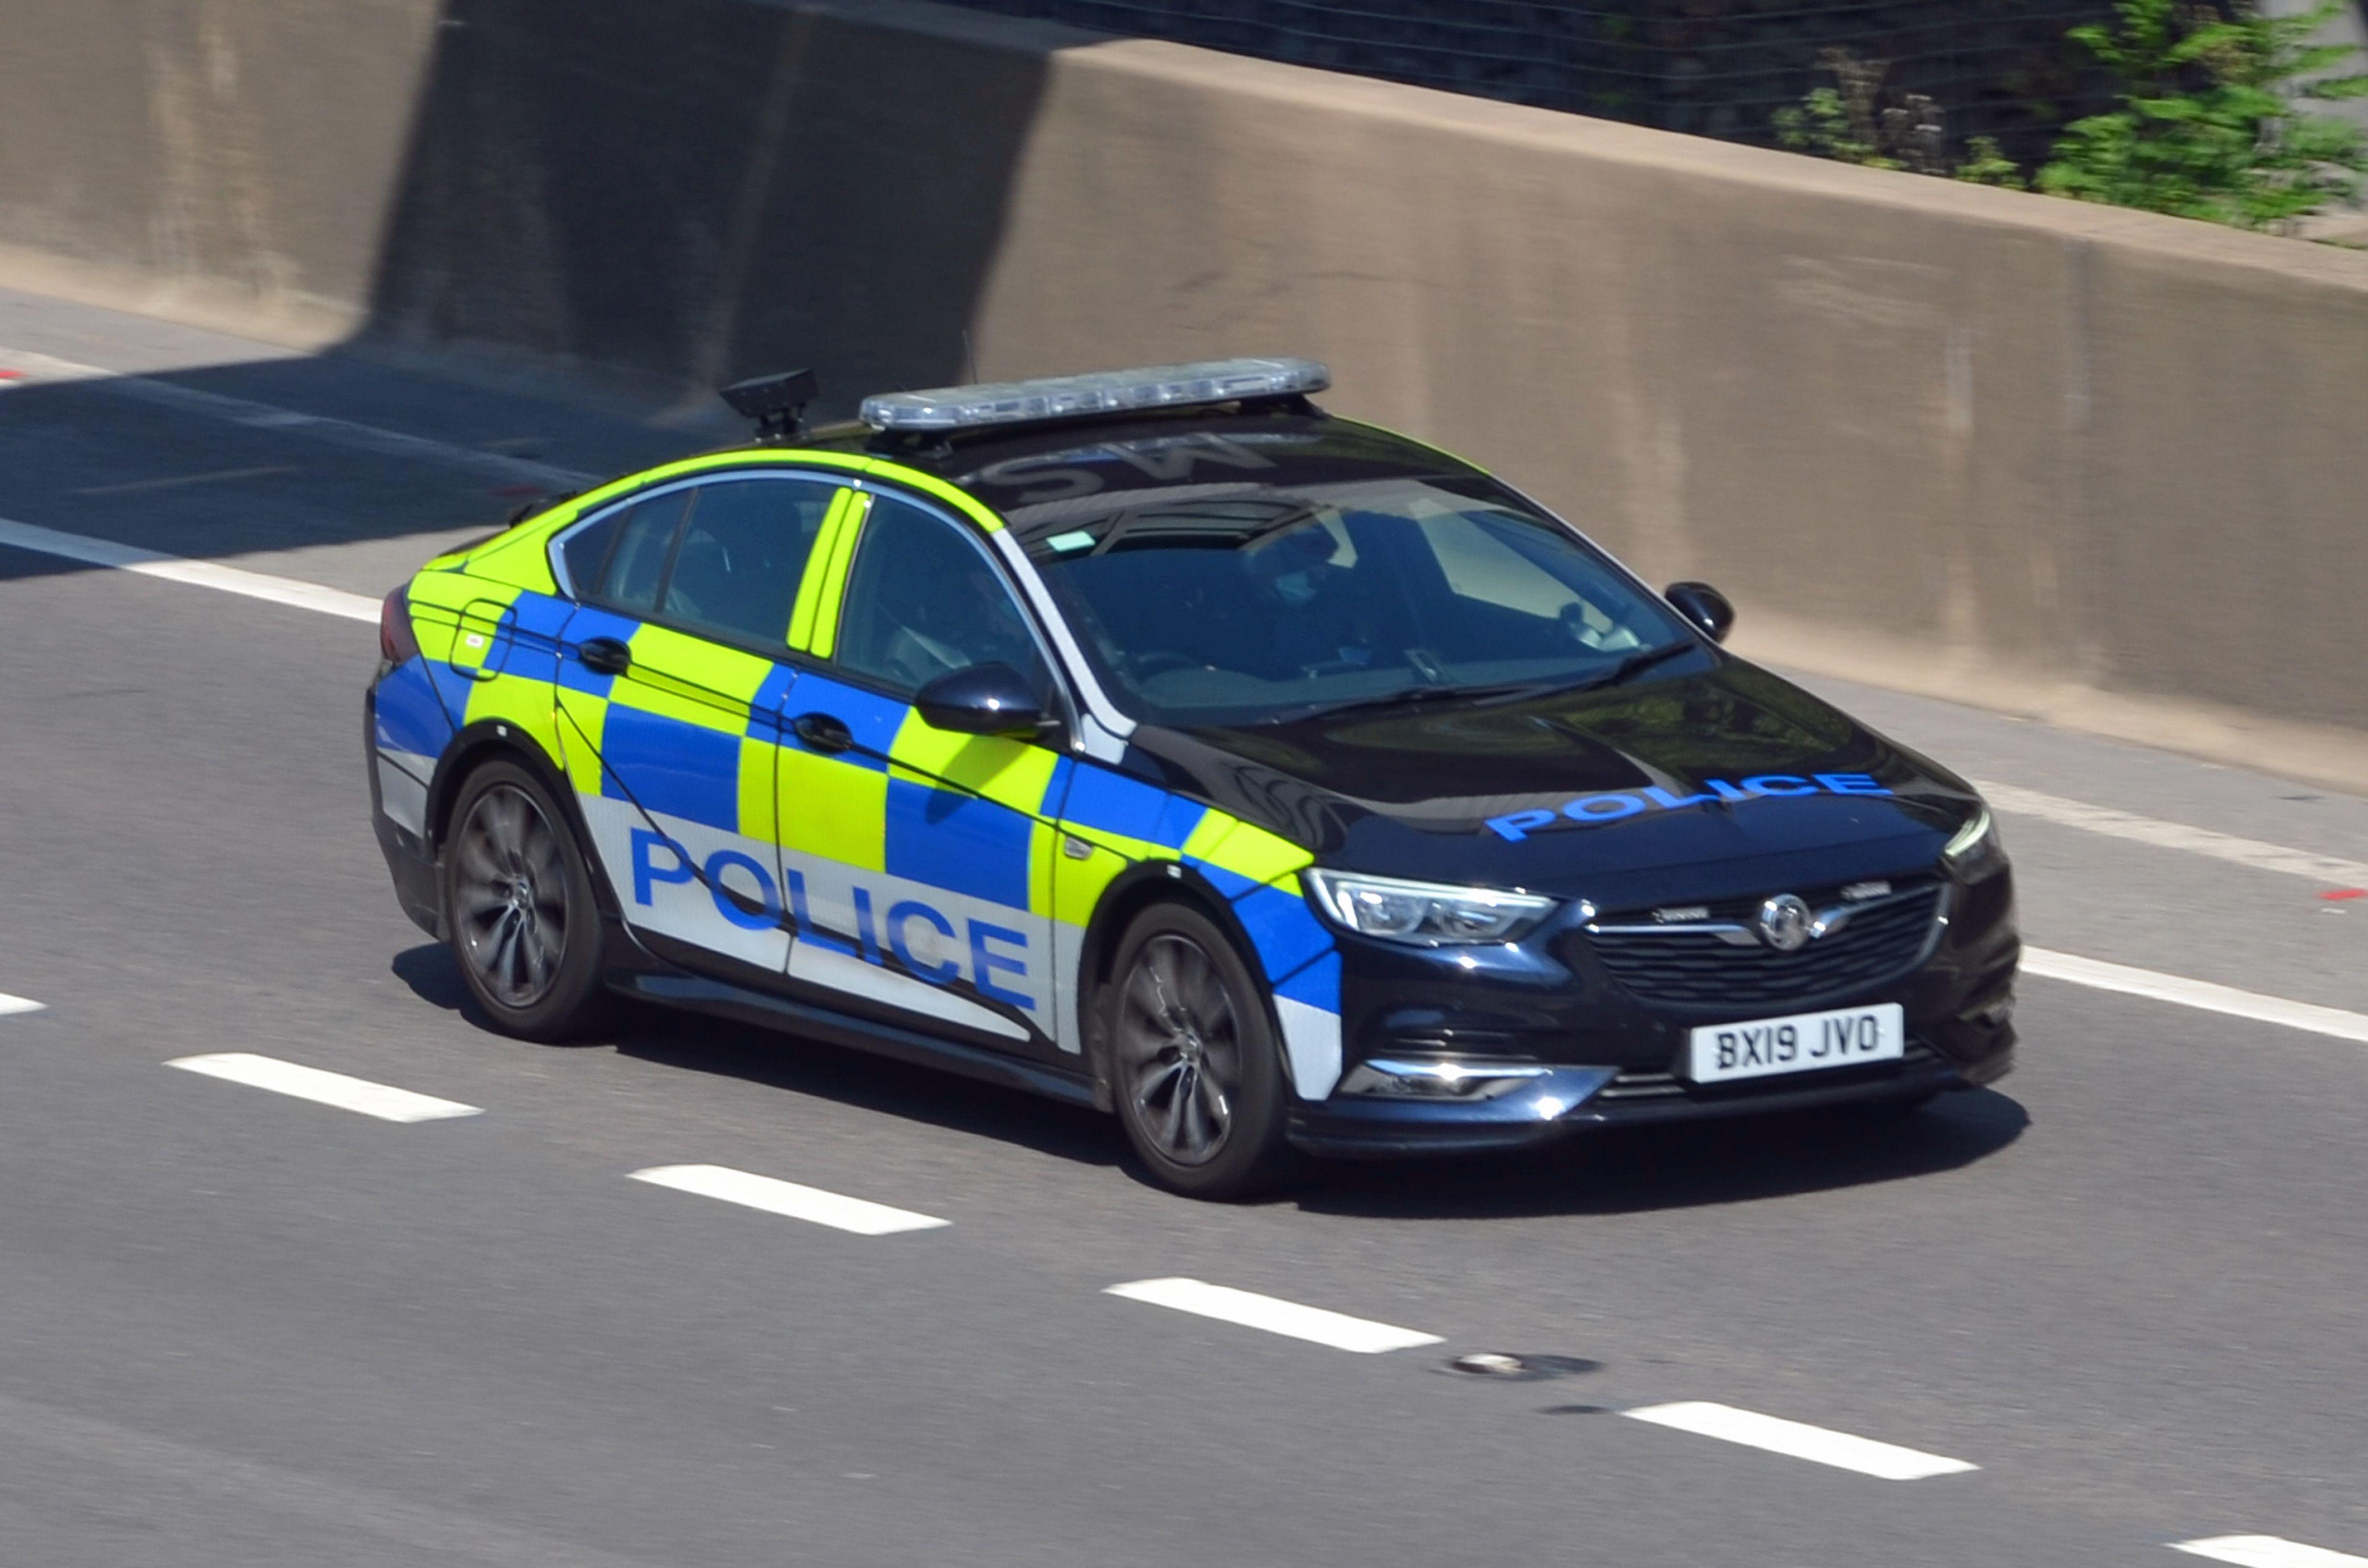 Bx19 Jvo Vauxhall Insignia Vauxhall Emergency Vehicles